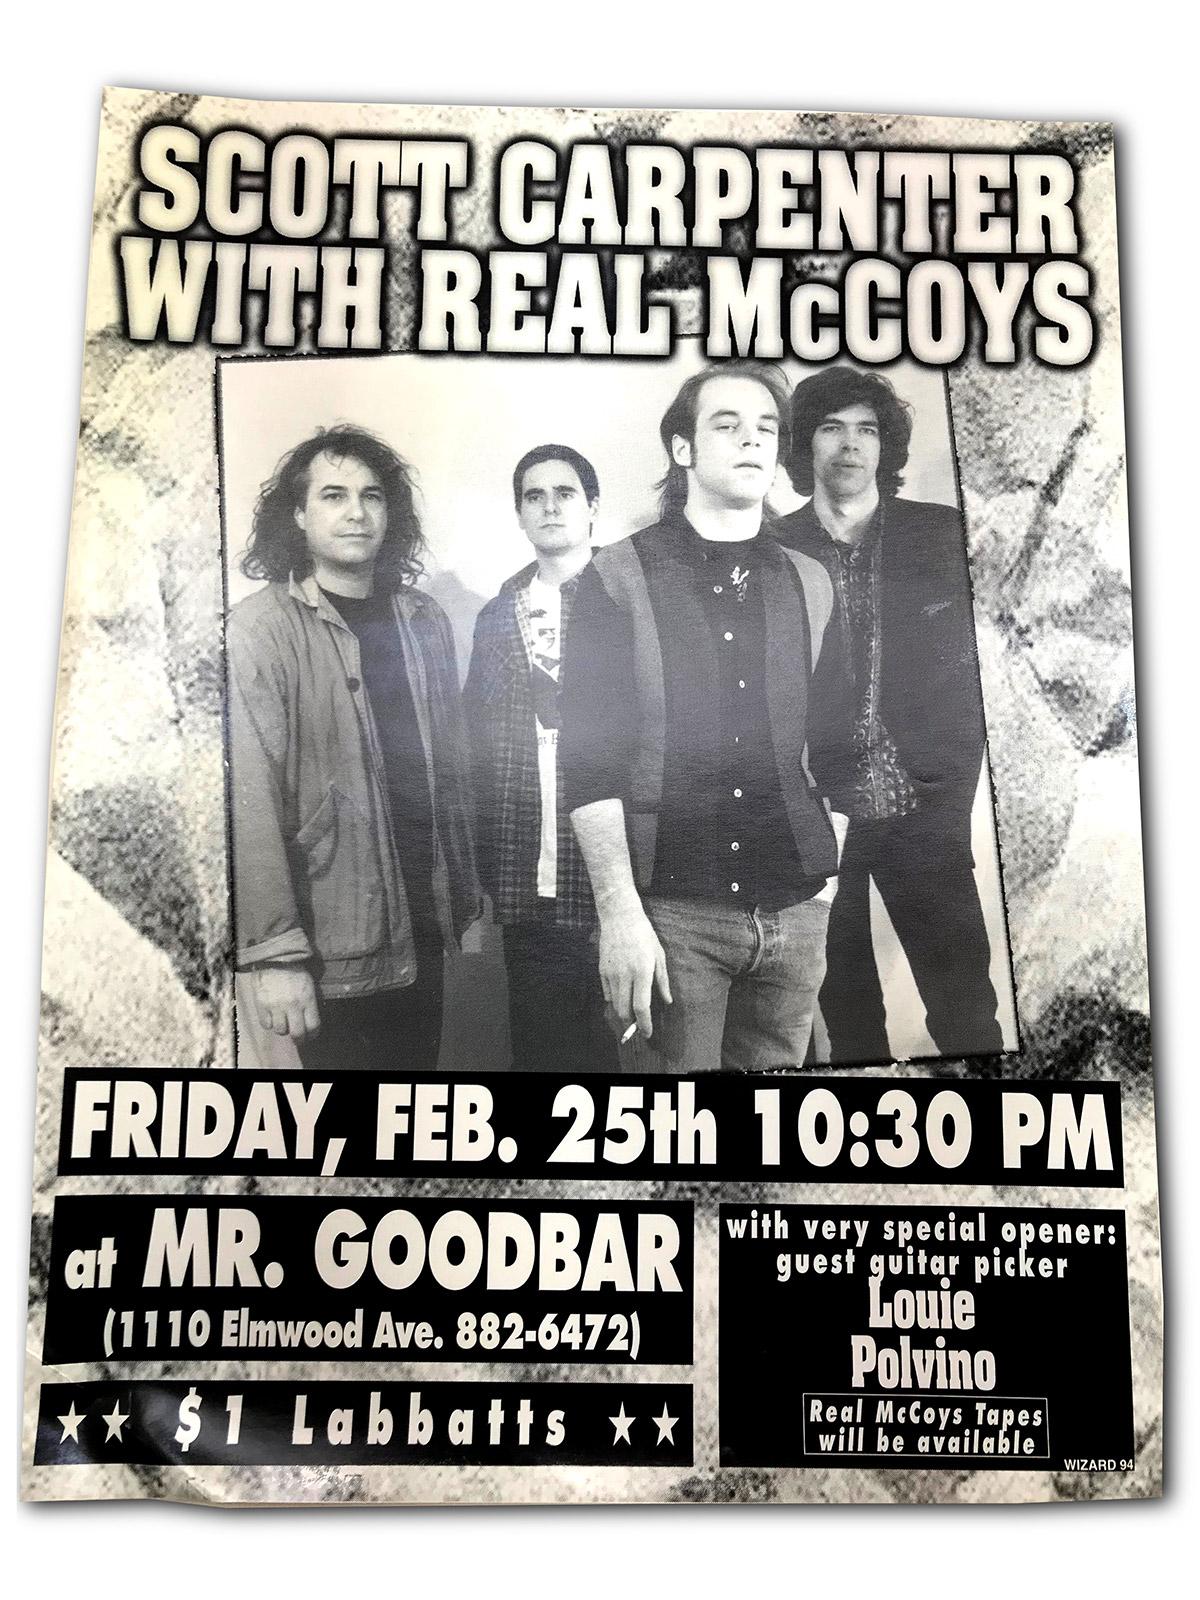 scott carpenter, real McCoys, matt smith, buffalo, ny, rock poster, Mr goodbars